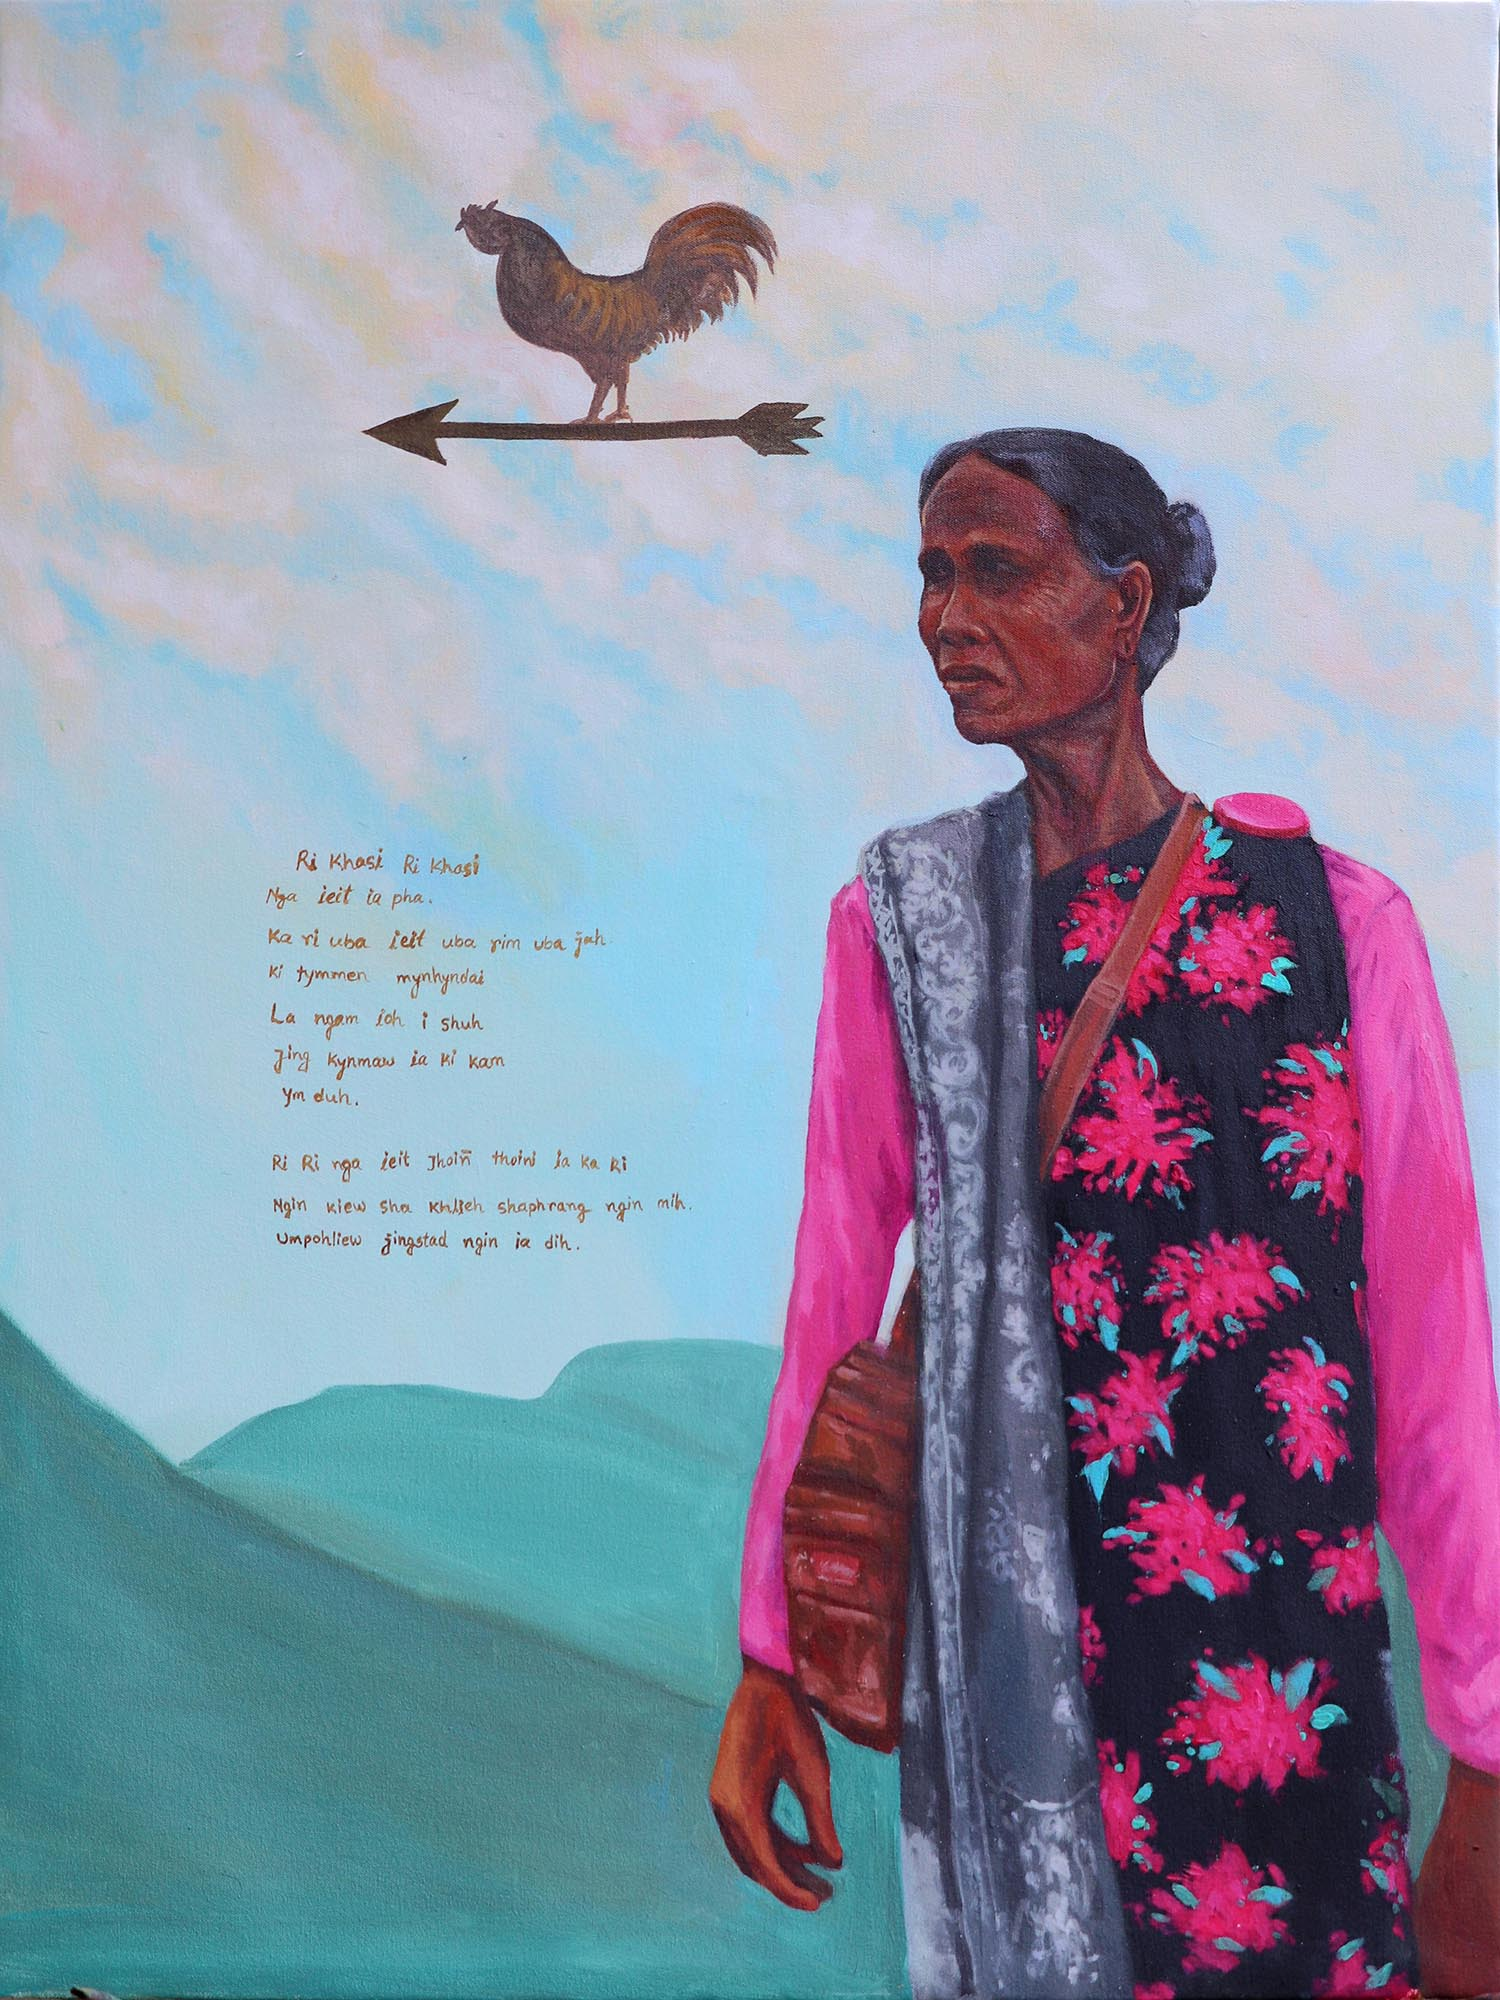 Md Imtiaj Islam, Ri Khasi, Acrylic on canvas, 100 x 75 cm, 2019